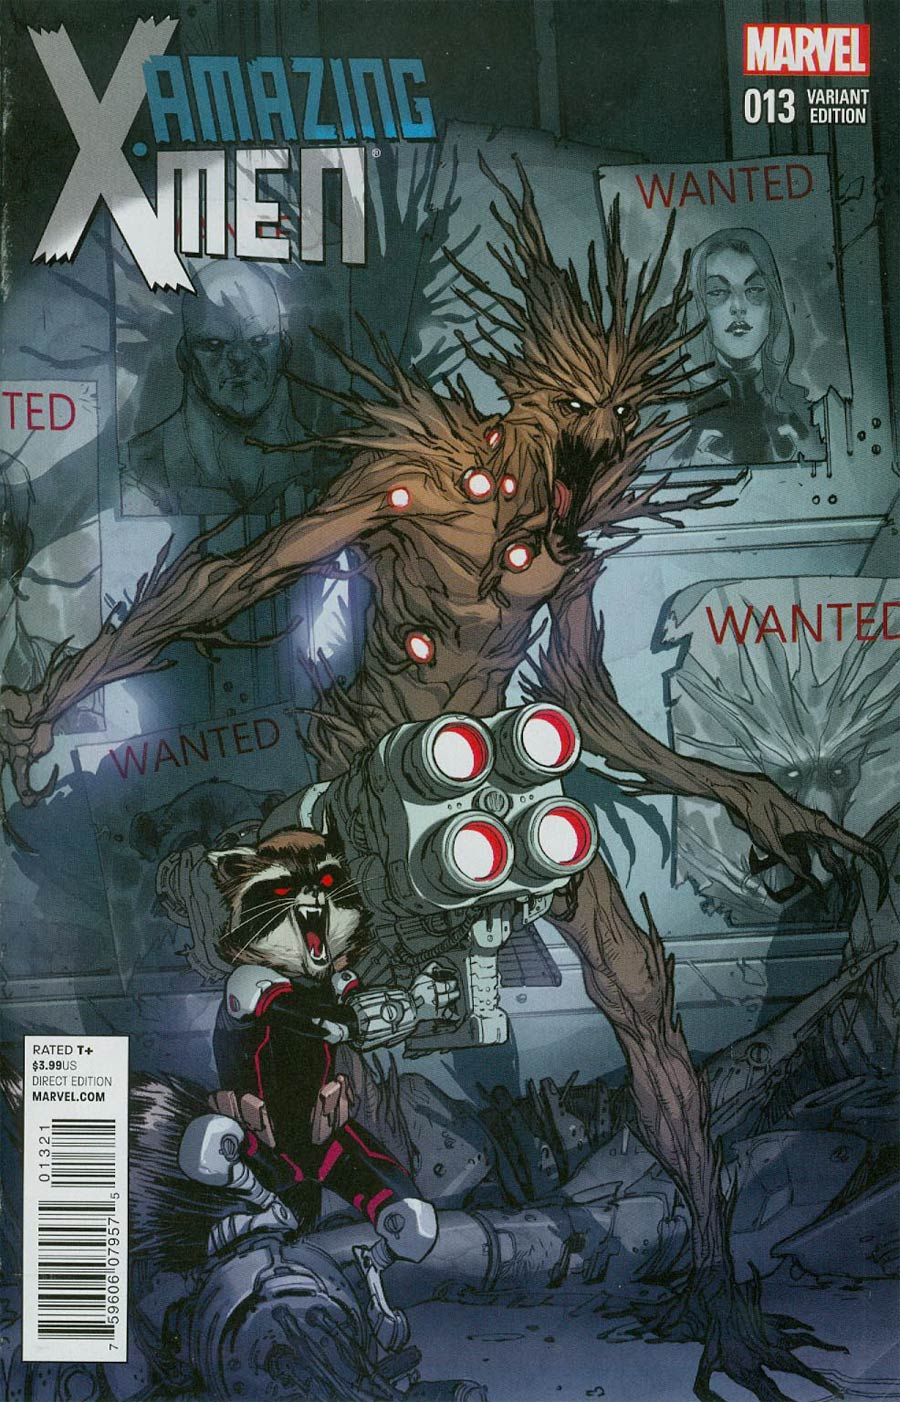 Amazing X-Men Vol 2 #13 Cover B Variant Rocket Raccoon & Groot Cover